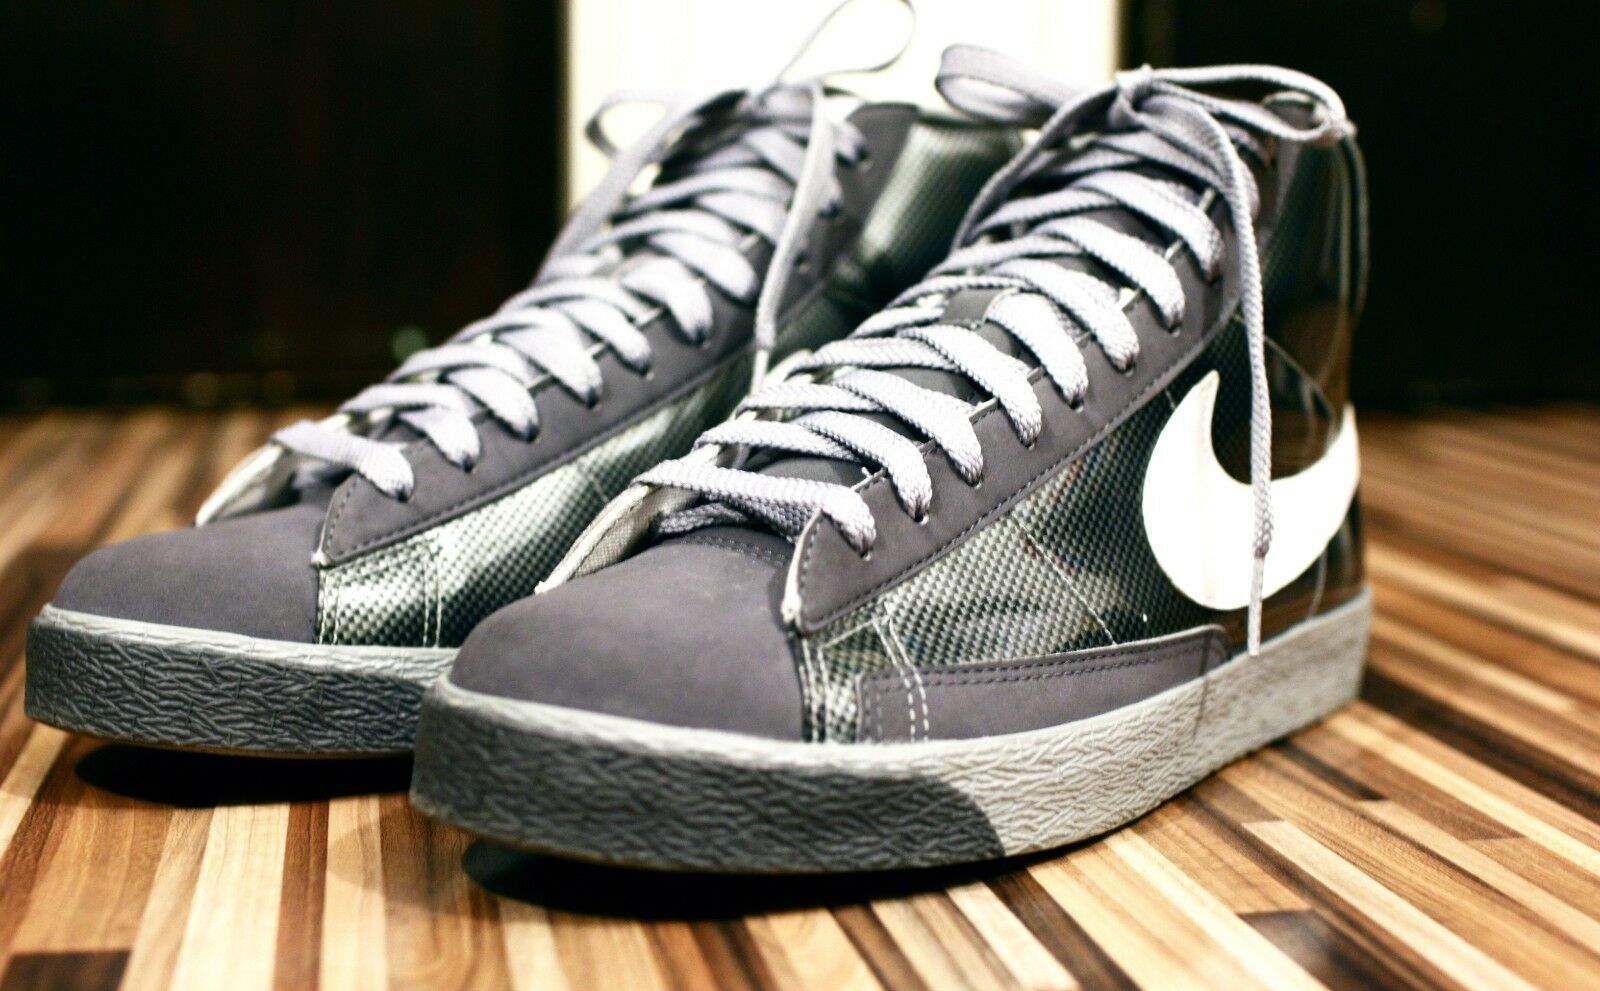 Nike Blazer in fibra di carbonio Vapormax bianco sporco 95 97 Force TN Plus